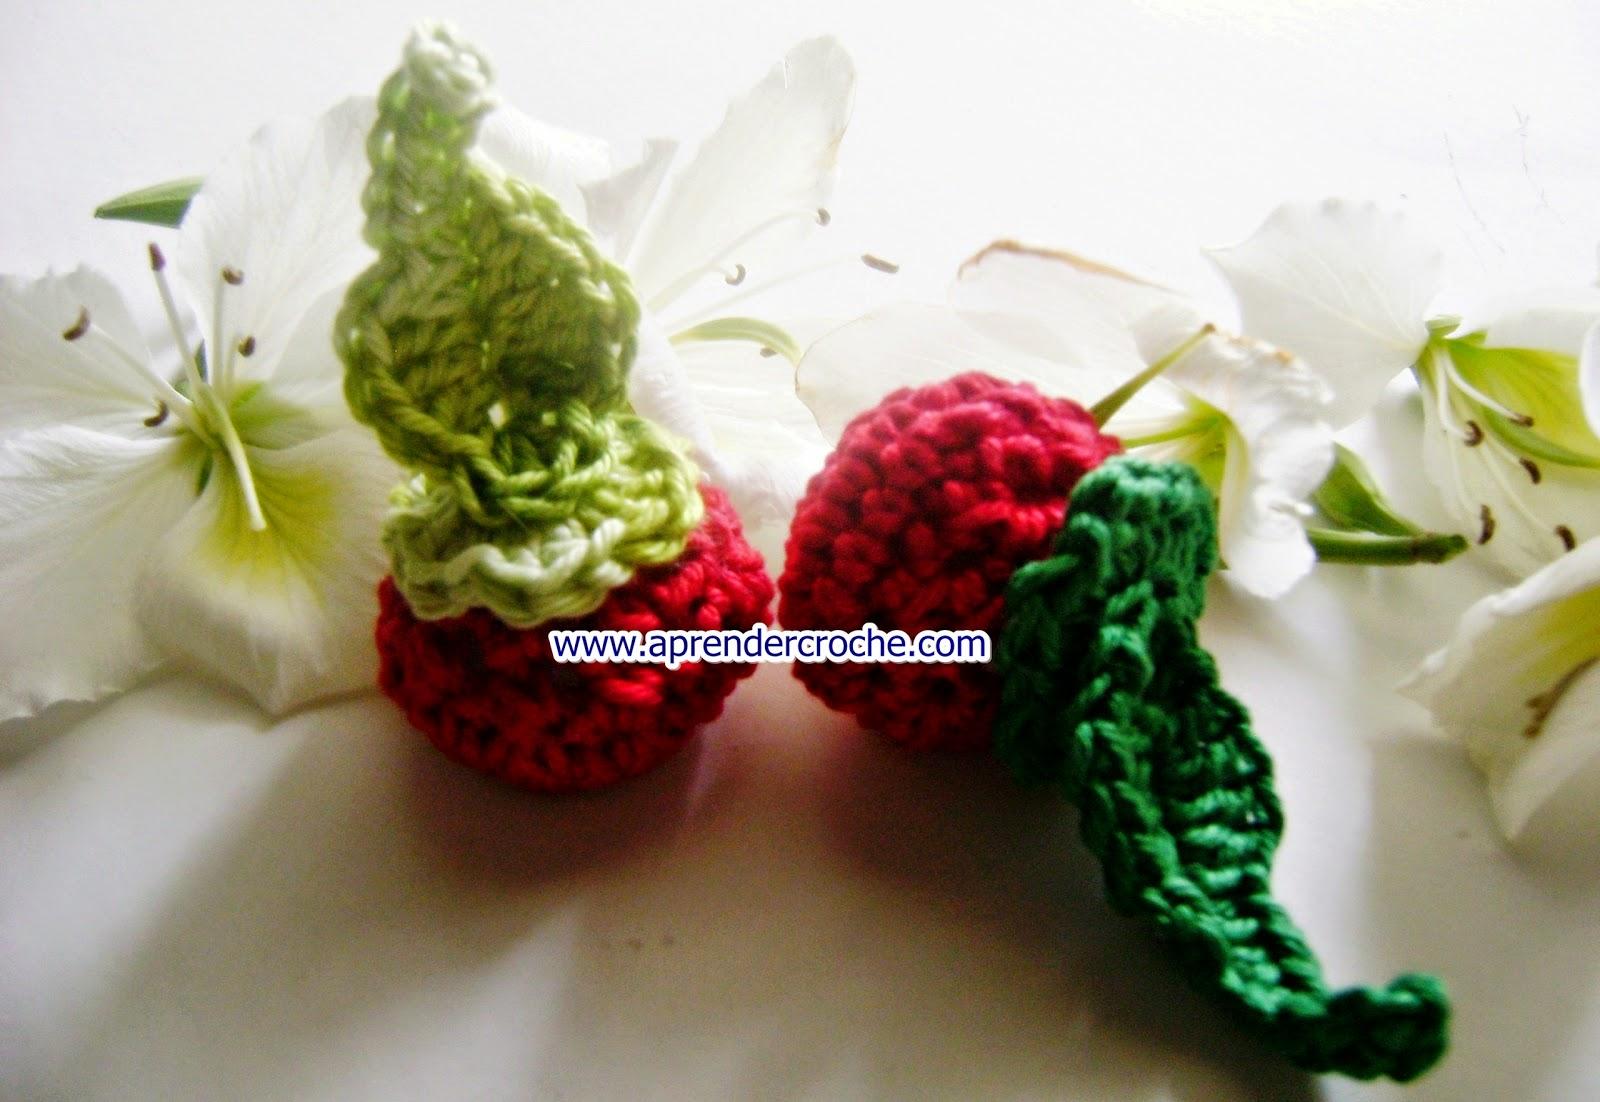 aprender croche frutas tomates legumes folhas dvd edinir-croche loja curso de croche